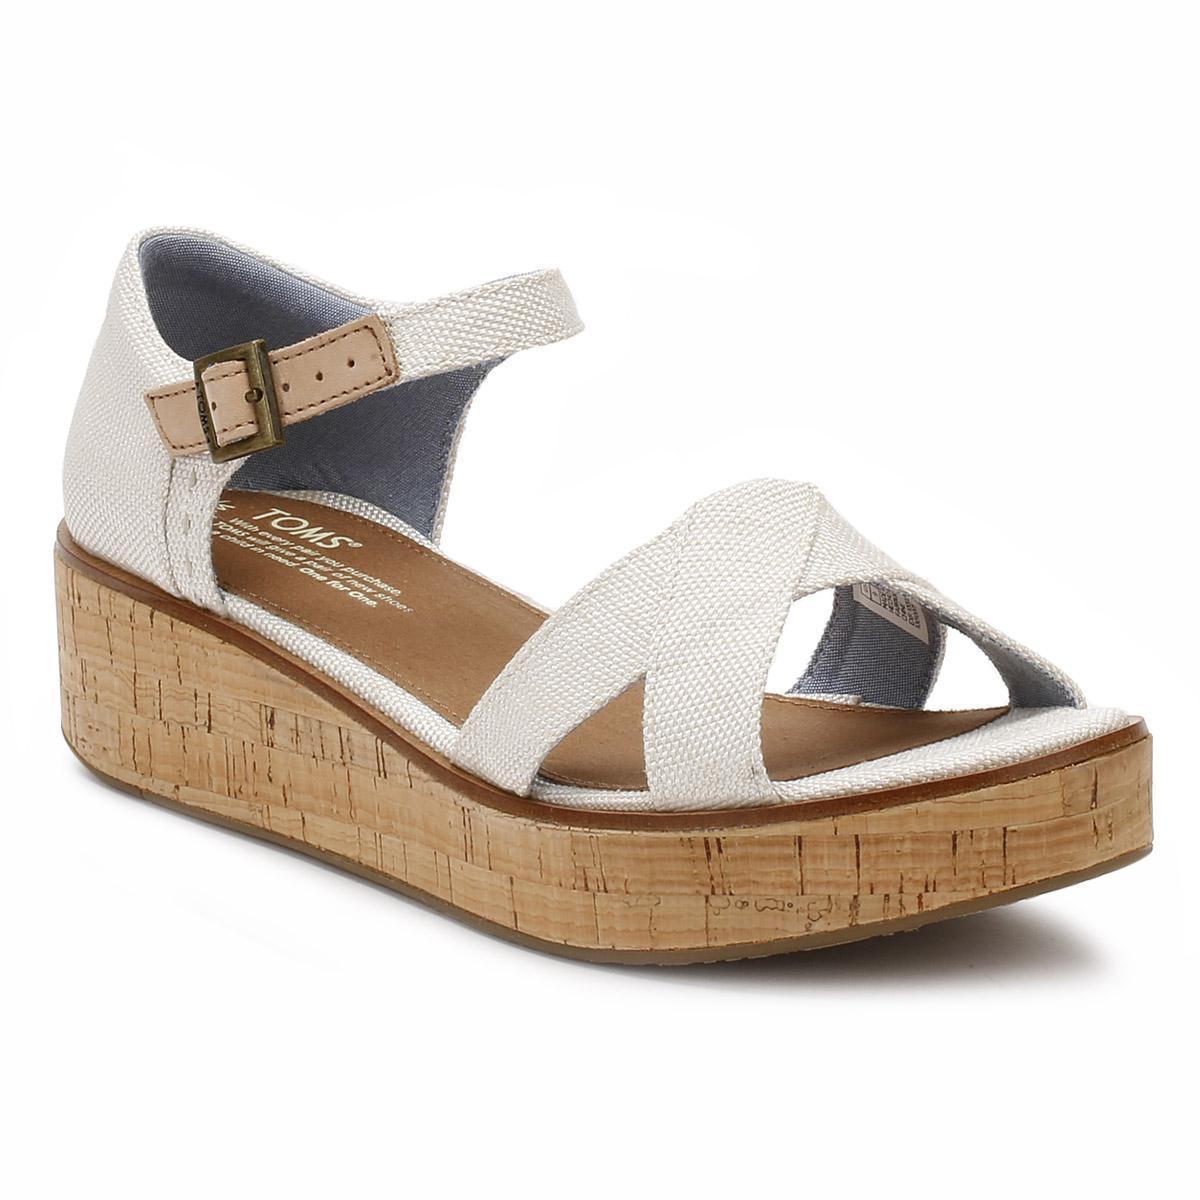 c4daf8c0062c Lyst - TOMS Womens Natural Yarn Dye Harper Platform Wedge Sandals